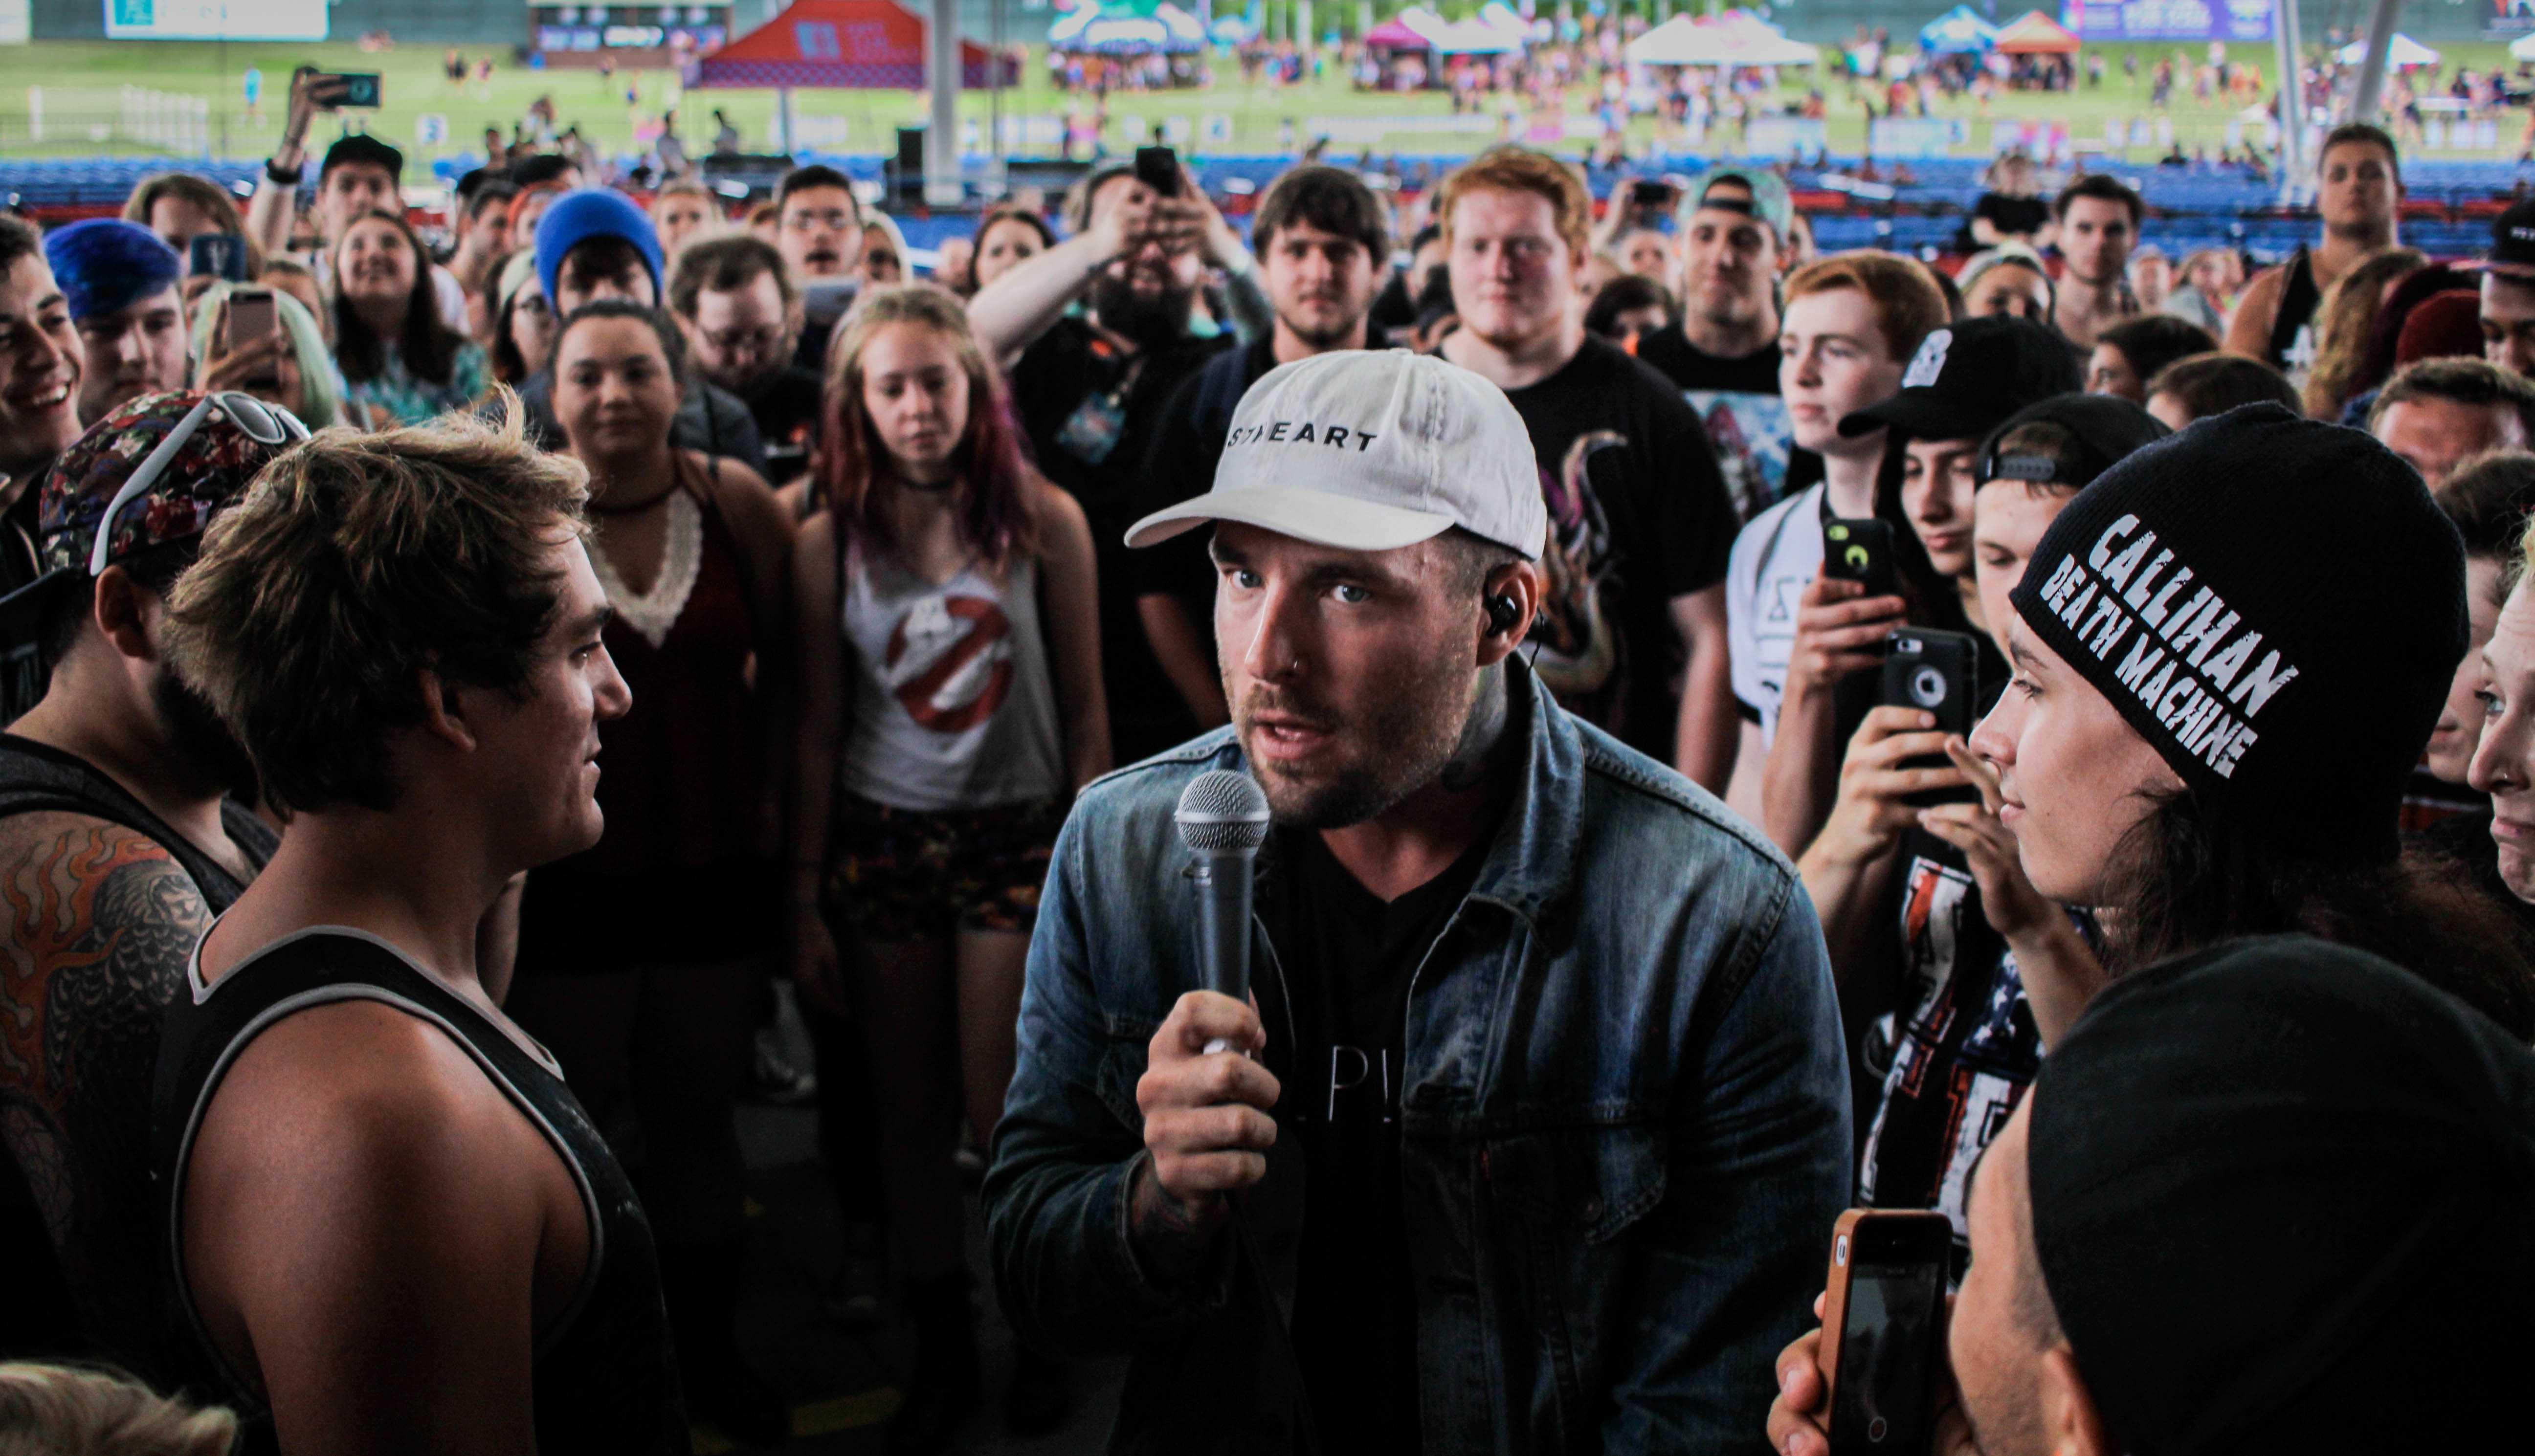 Bradley Waden, vocalist of Emarosa, joins the crowd at the Vans Warped Tour